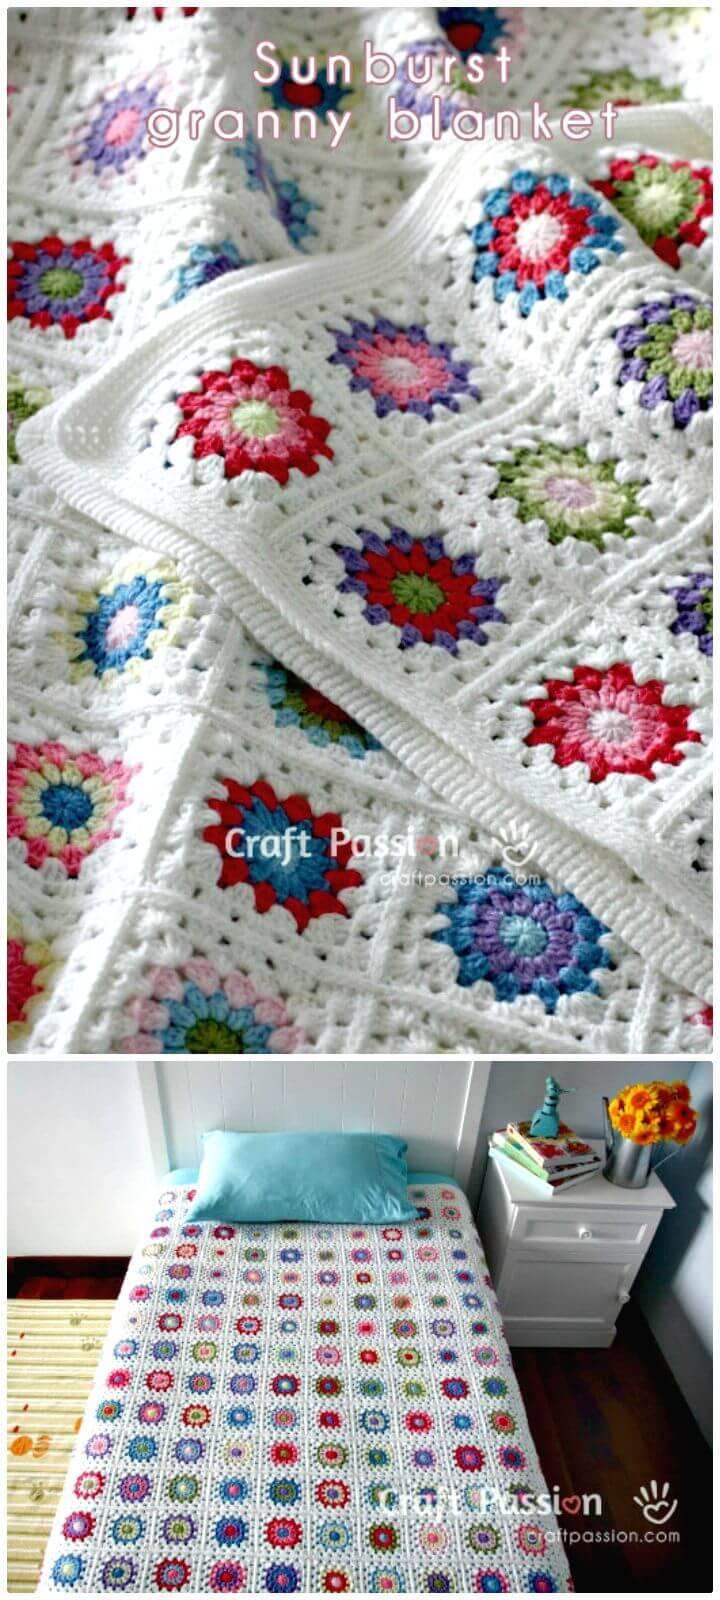 Häkeln Sie Sunburst Granny Square Blanket Pattern